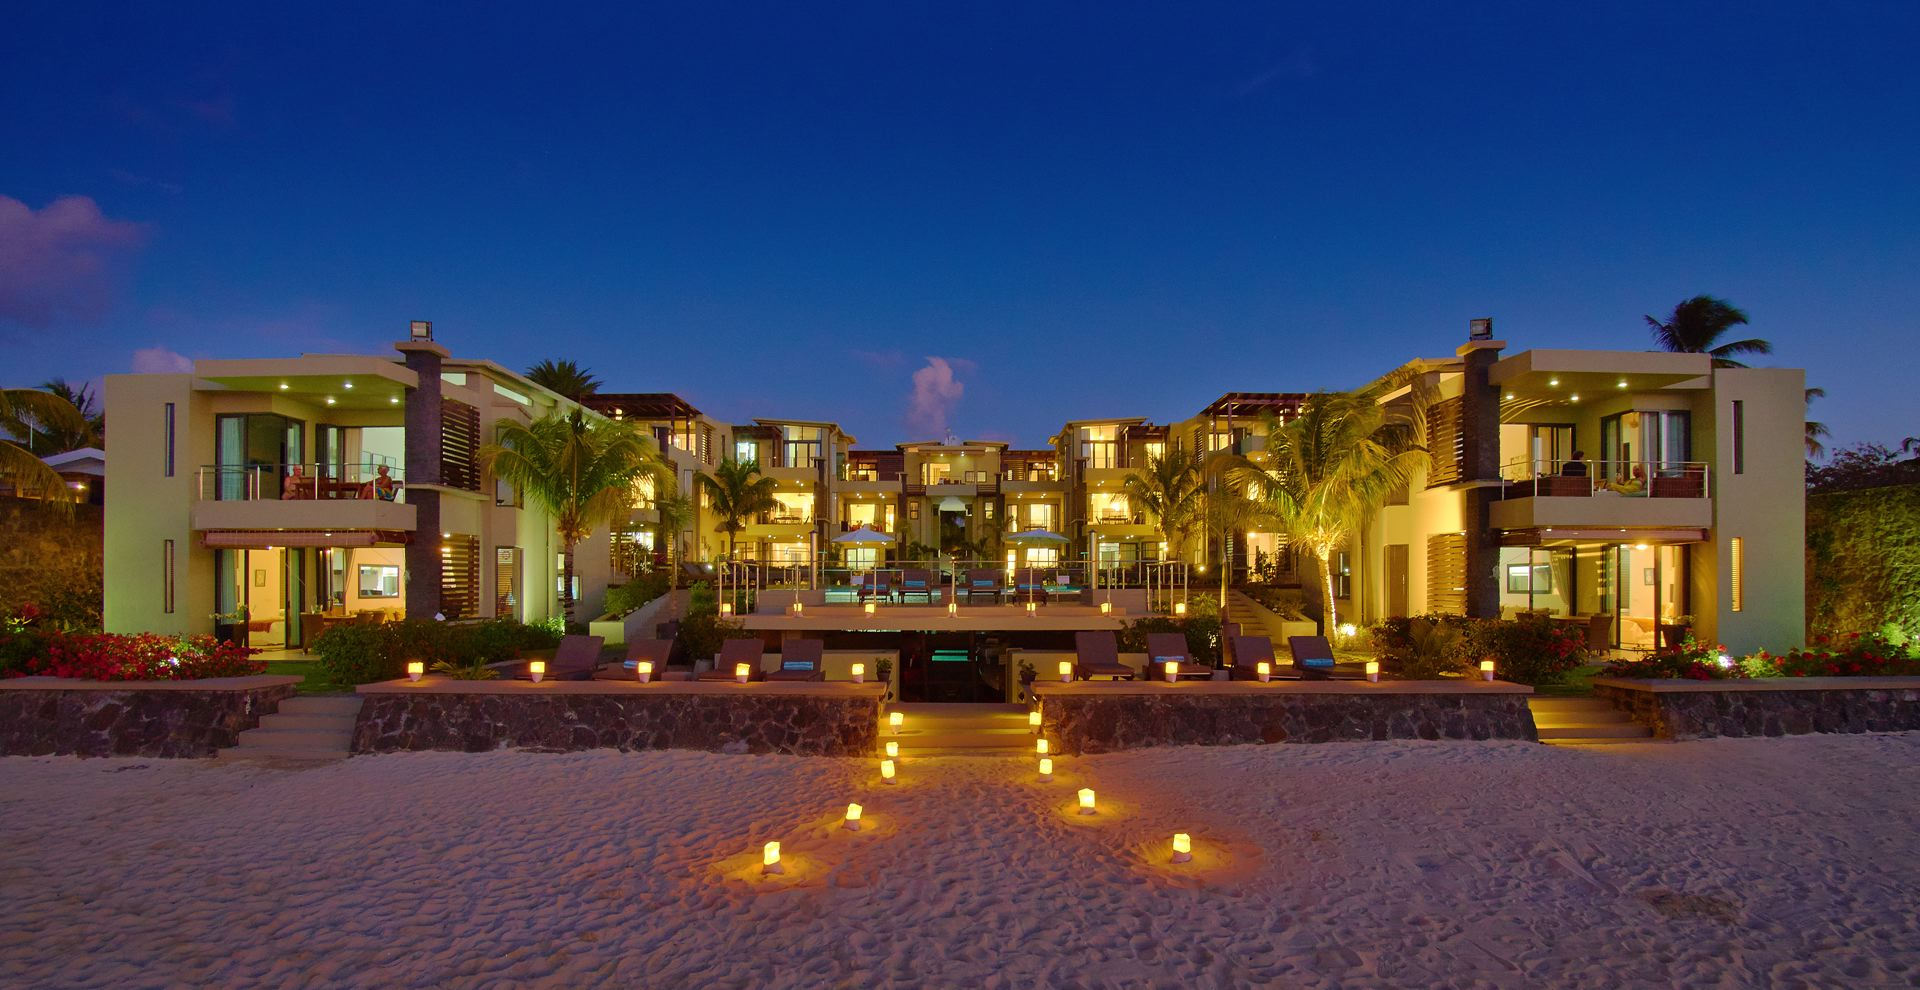 Lov. Le Cerisier Beach Apartments & Penthouses - View by Nig.jpg